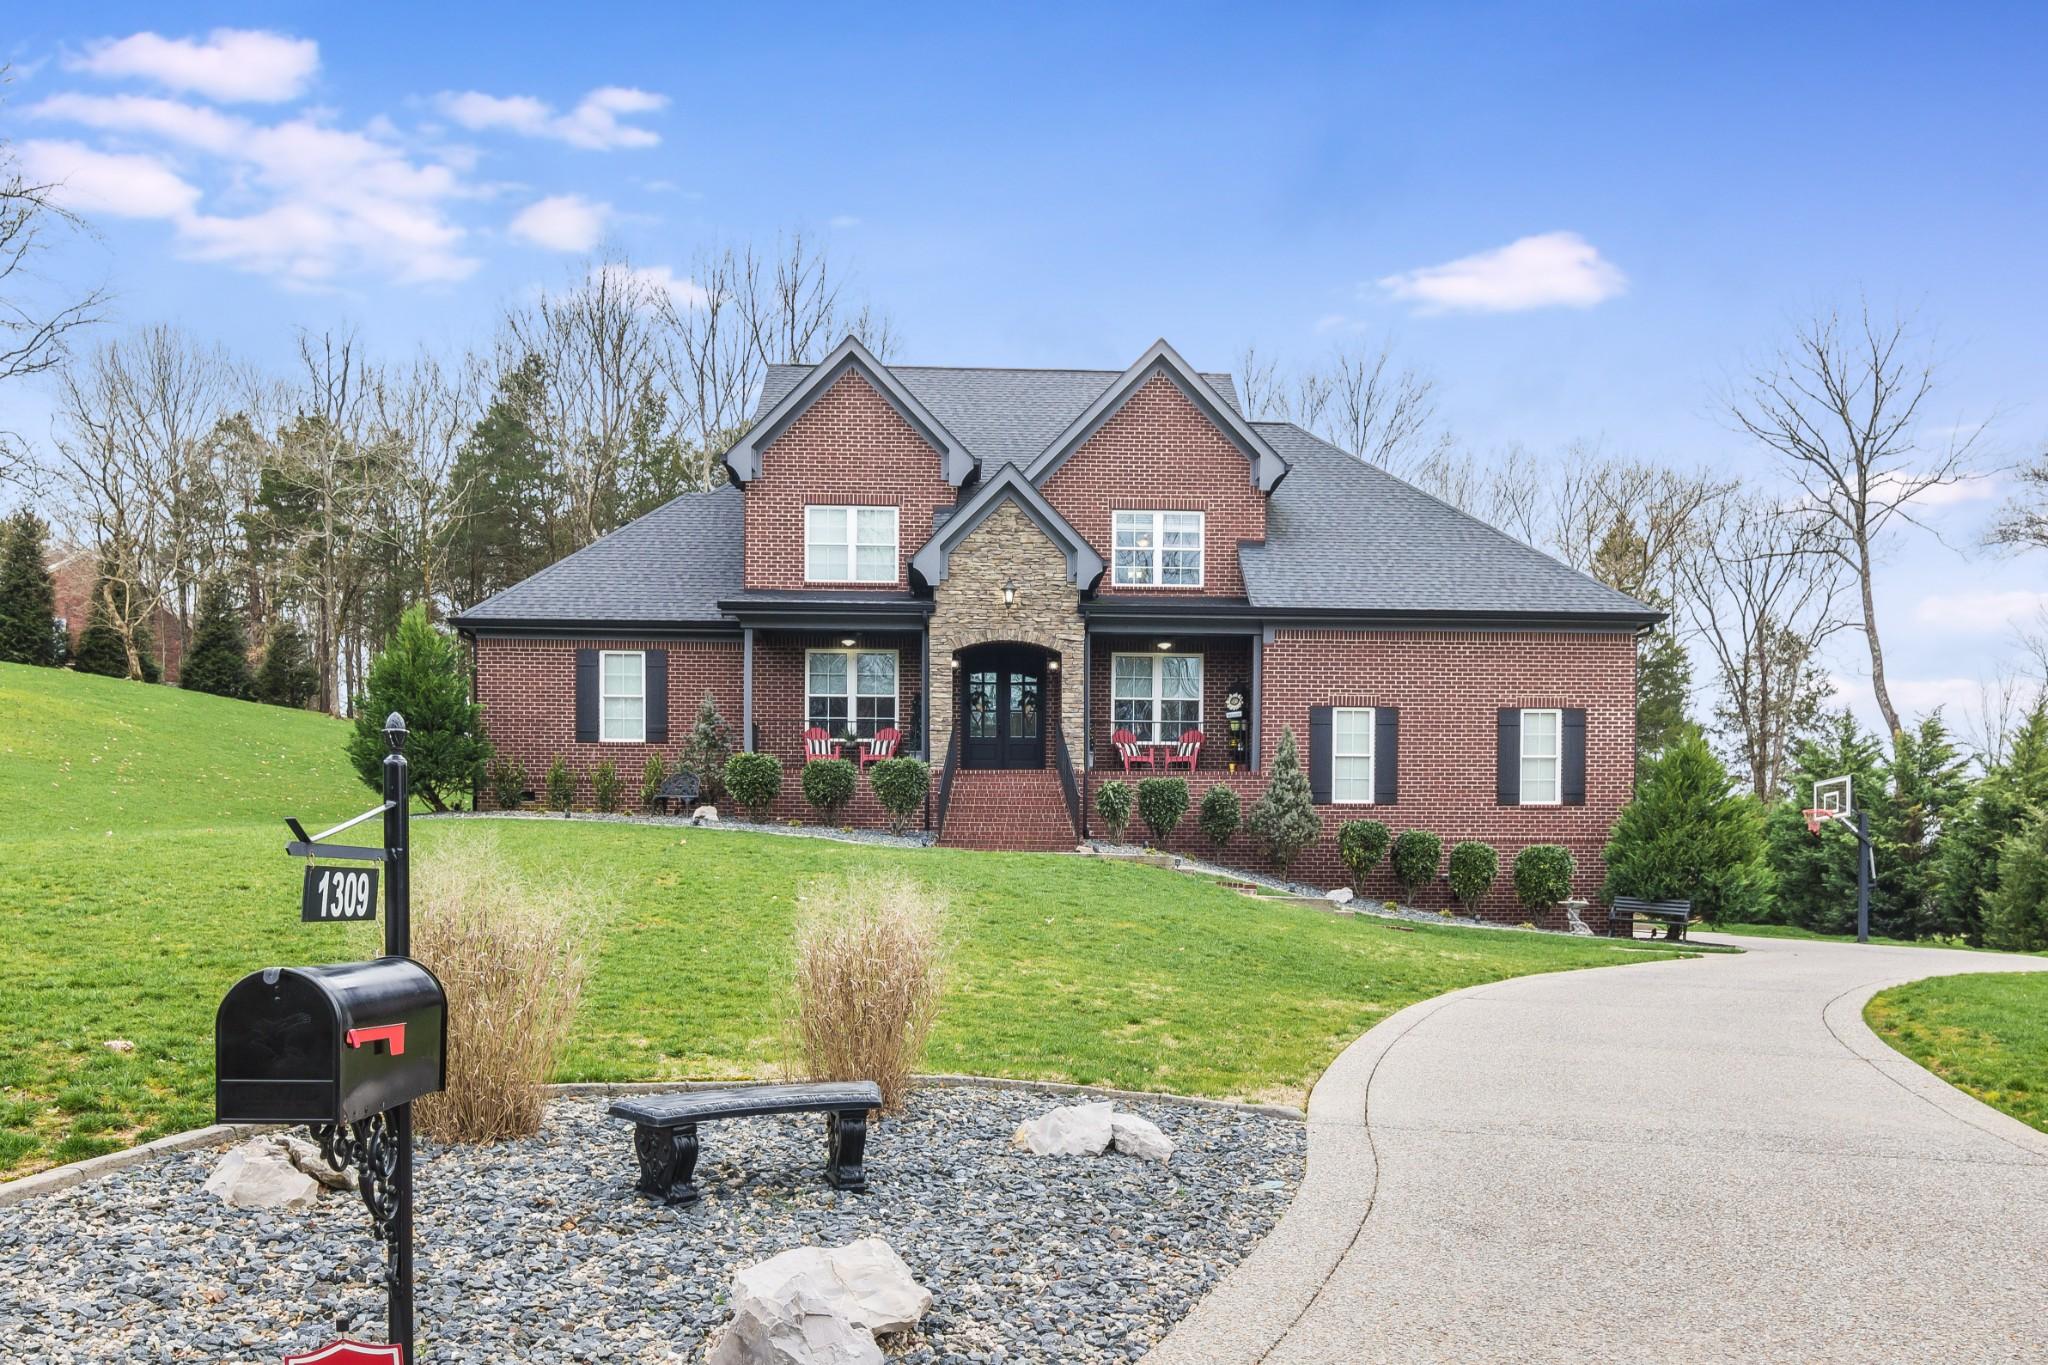 1309 Ashby Valley Ln, Arrington, TN 37014 - Arrington, TN real estate listing